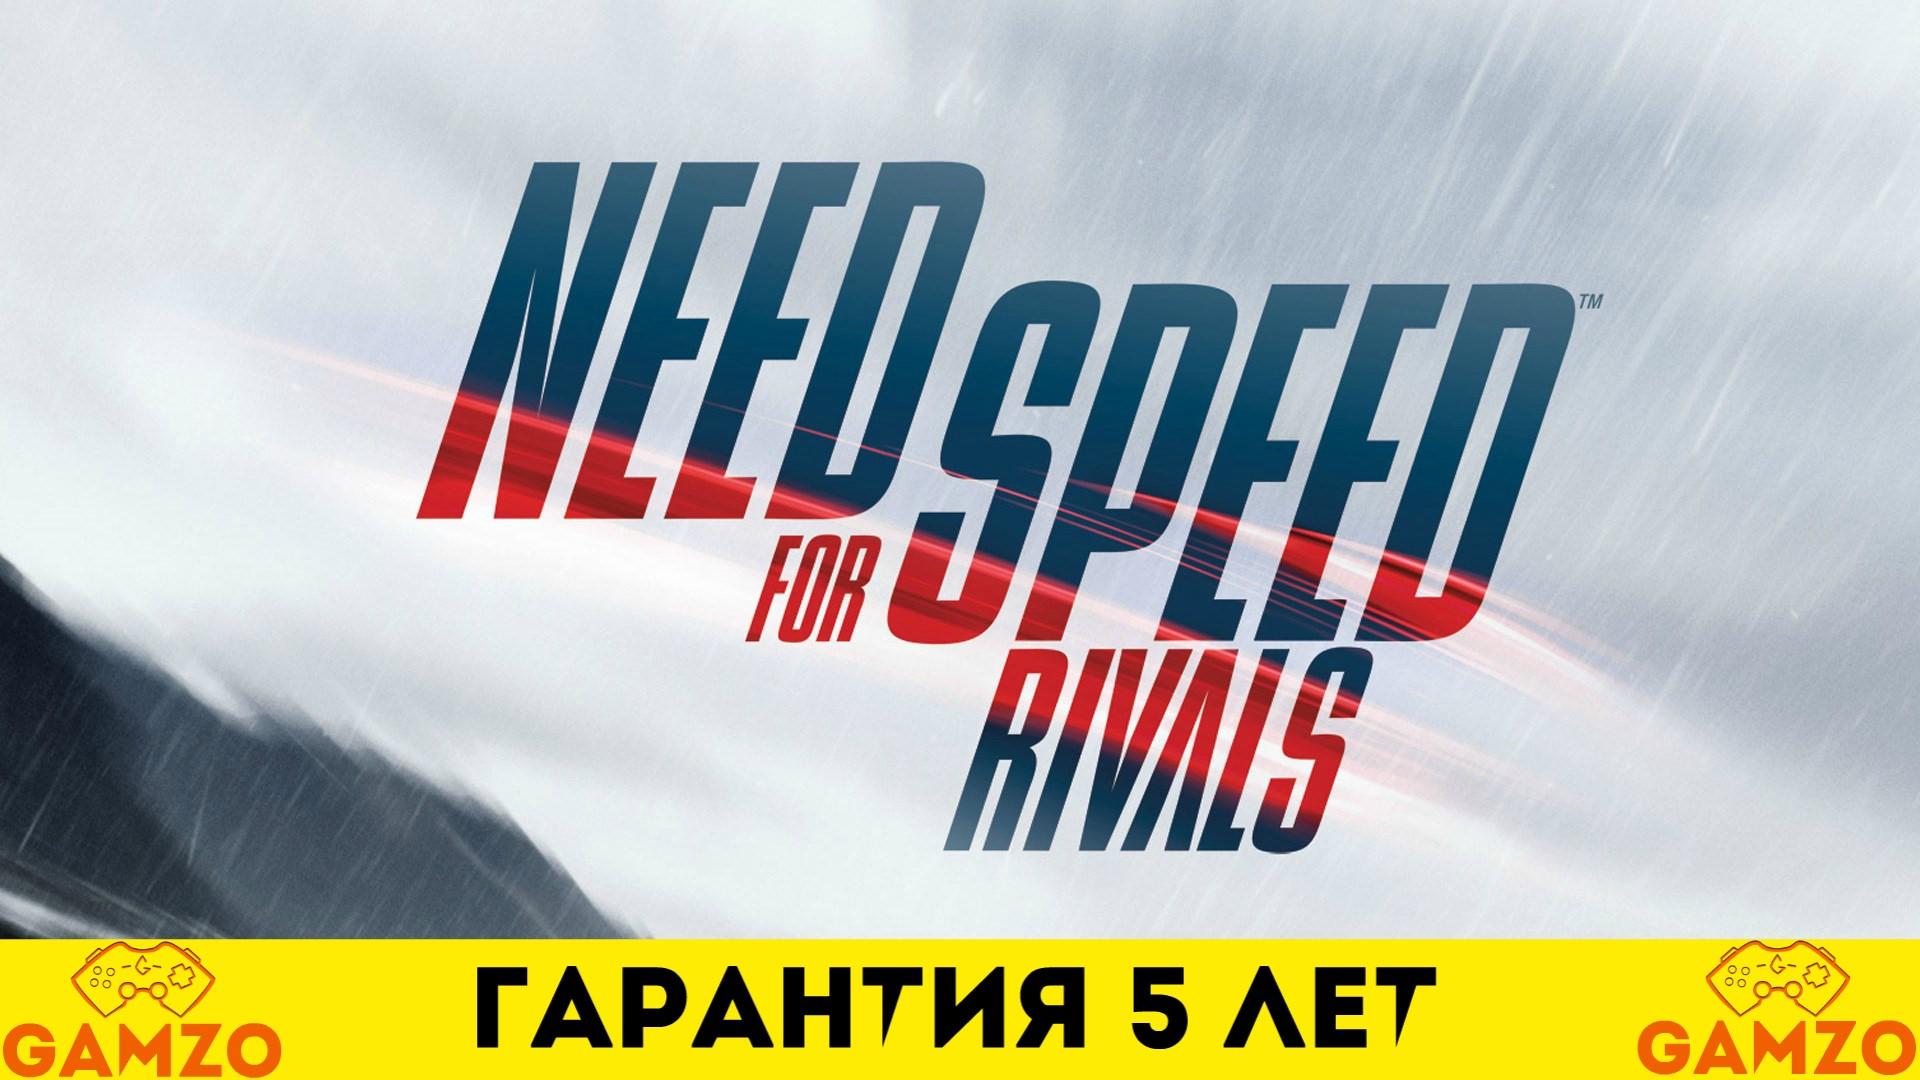 Need for Speed: Rivals | Гарантия 5 лет | + Подарок